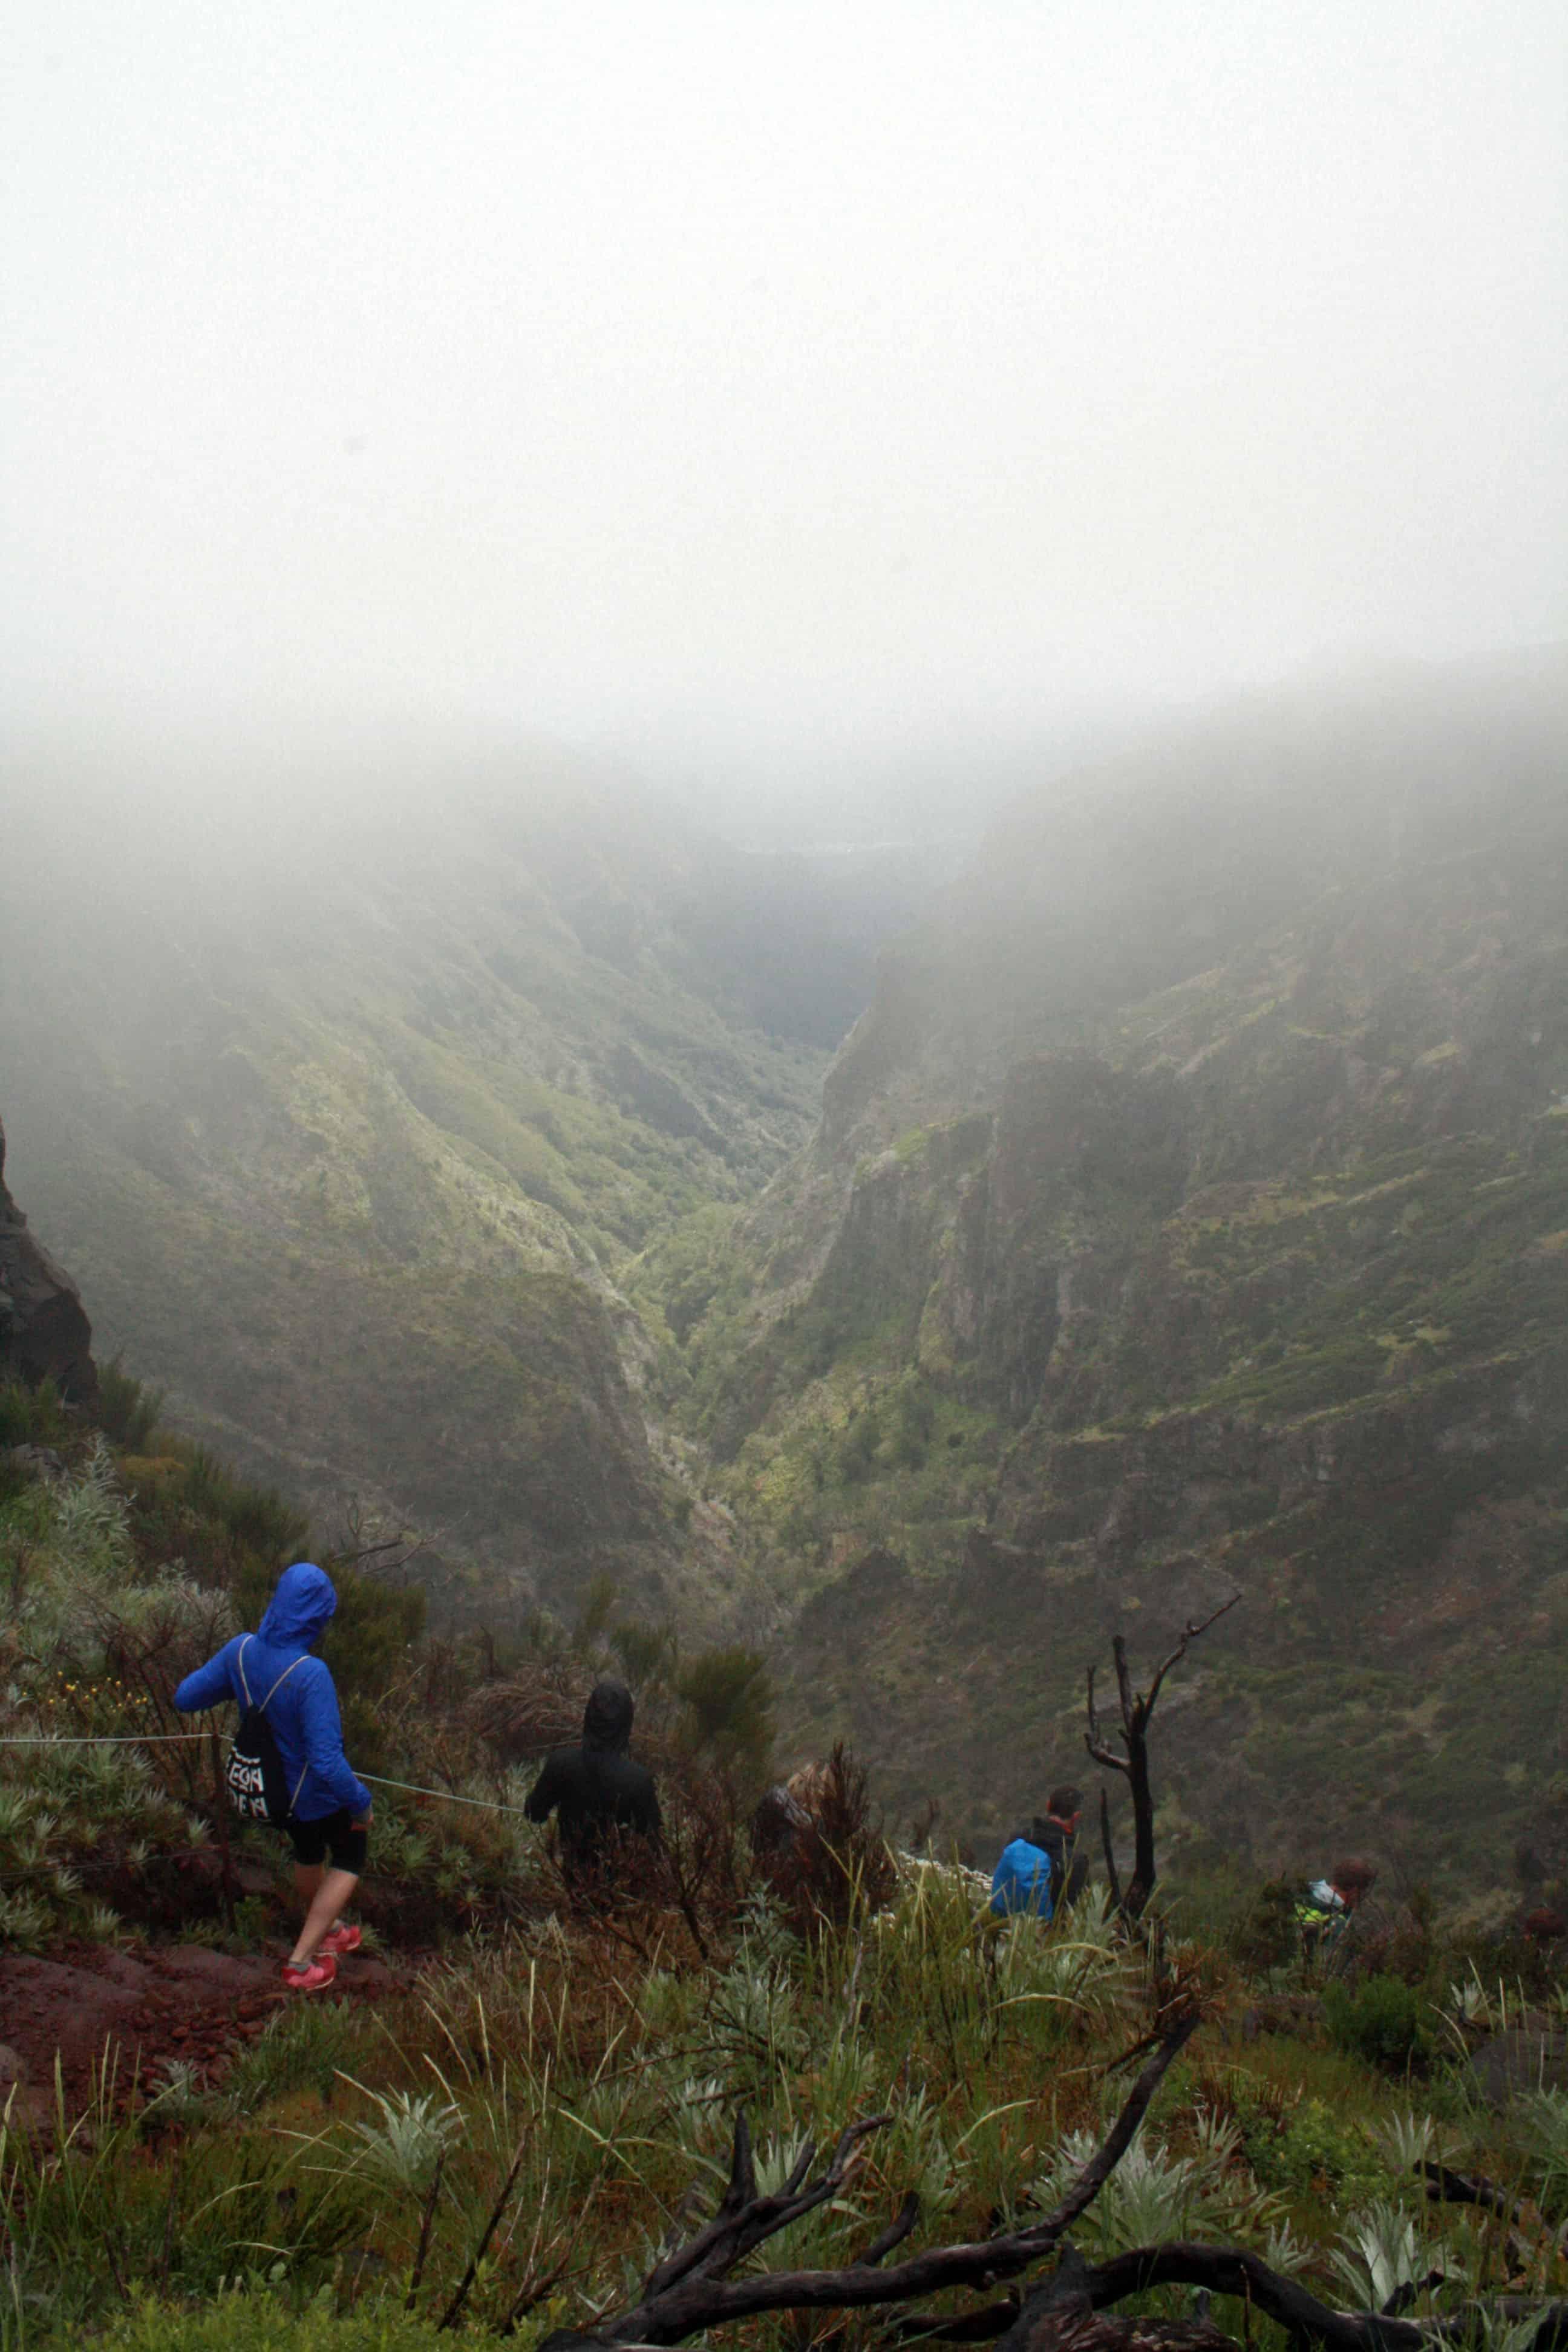 Hiking to Pico Ruivo from Pico do Arieiro